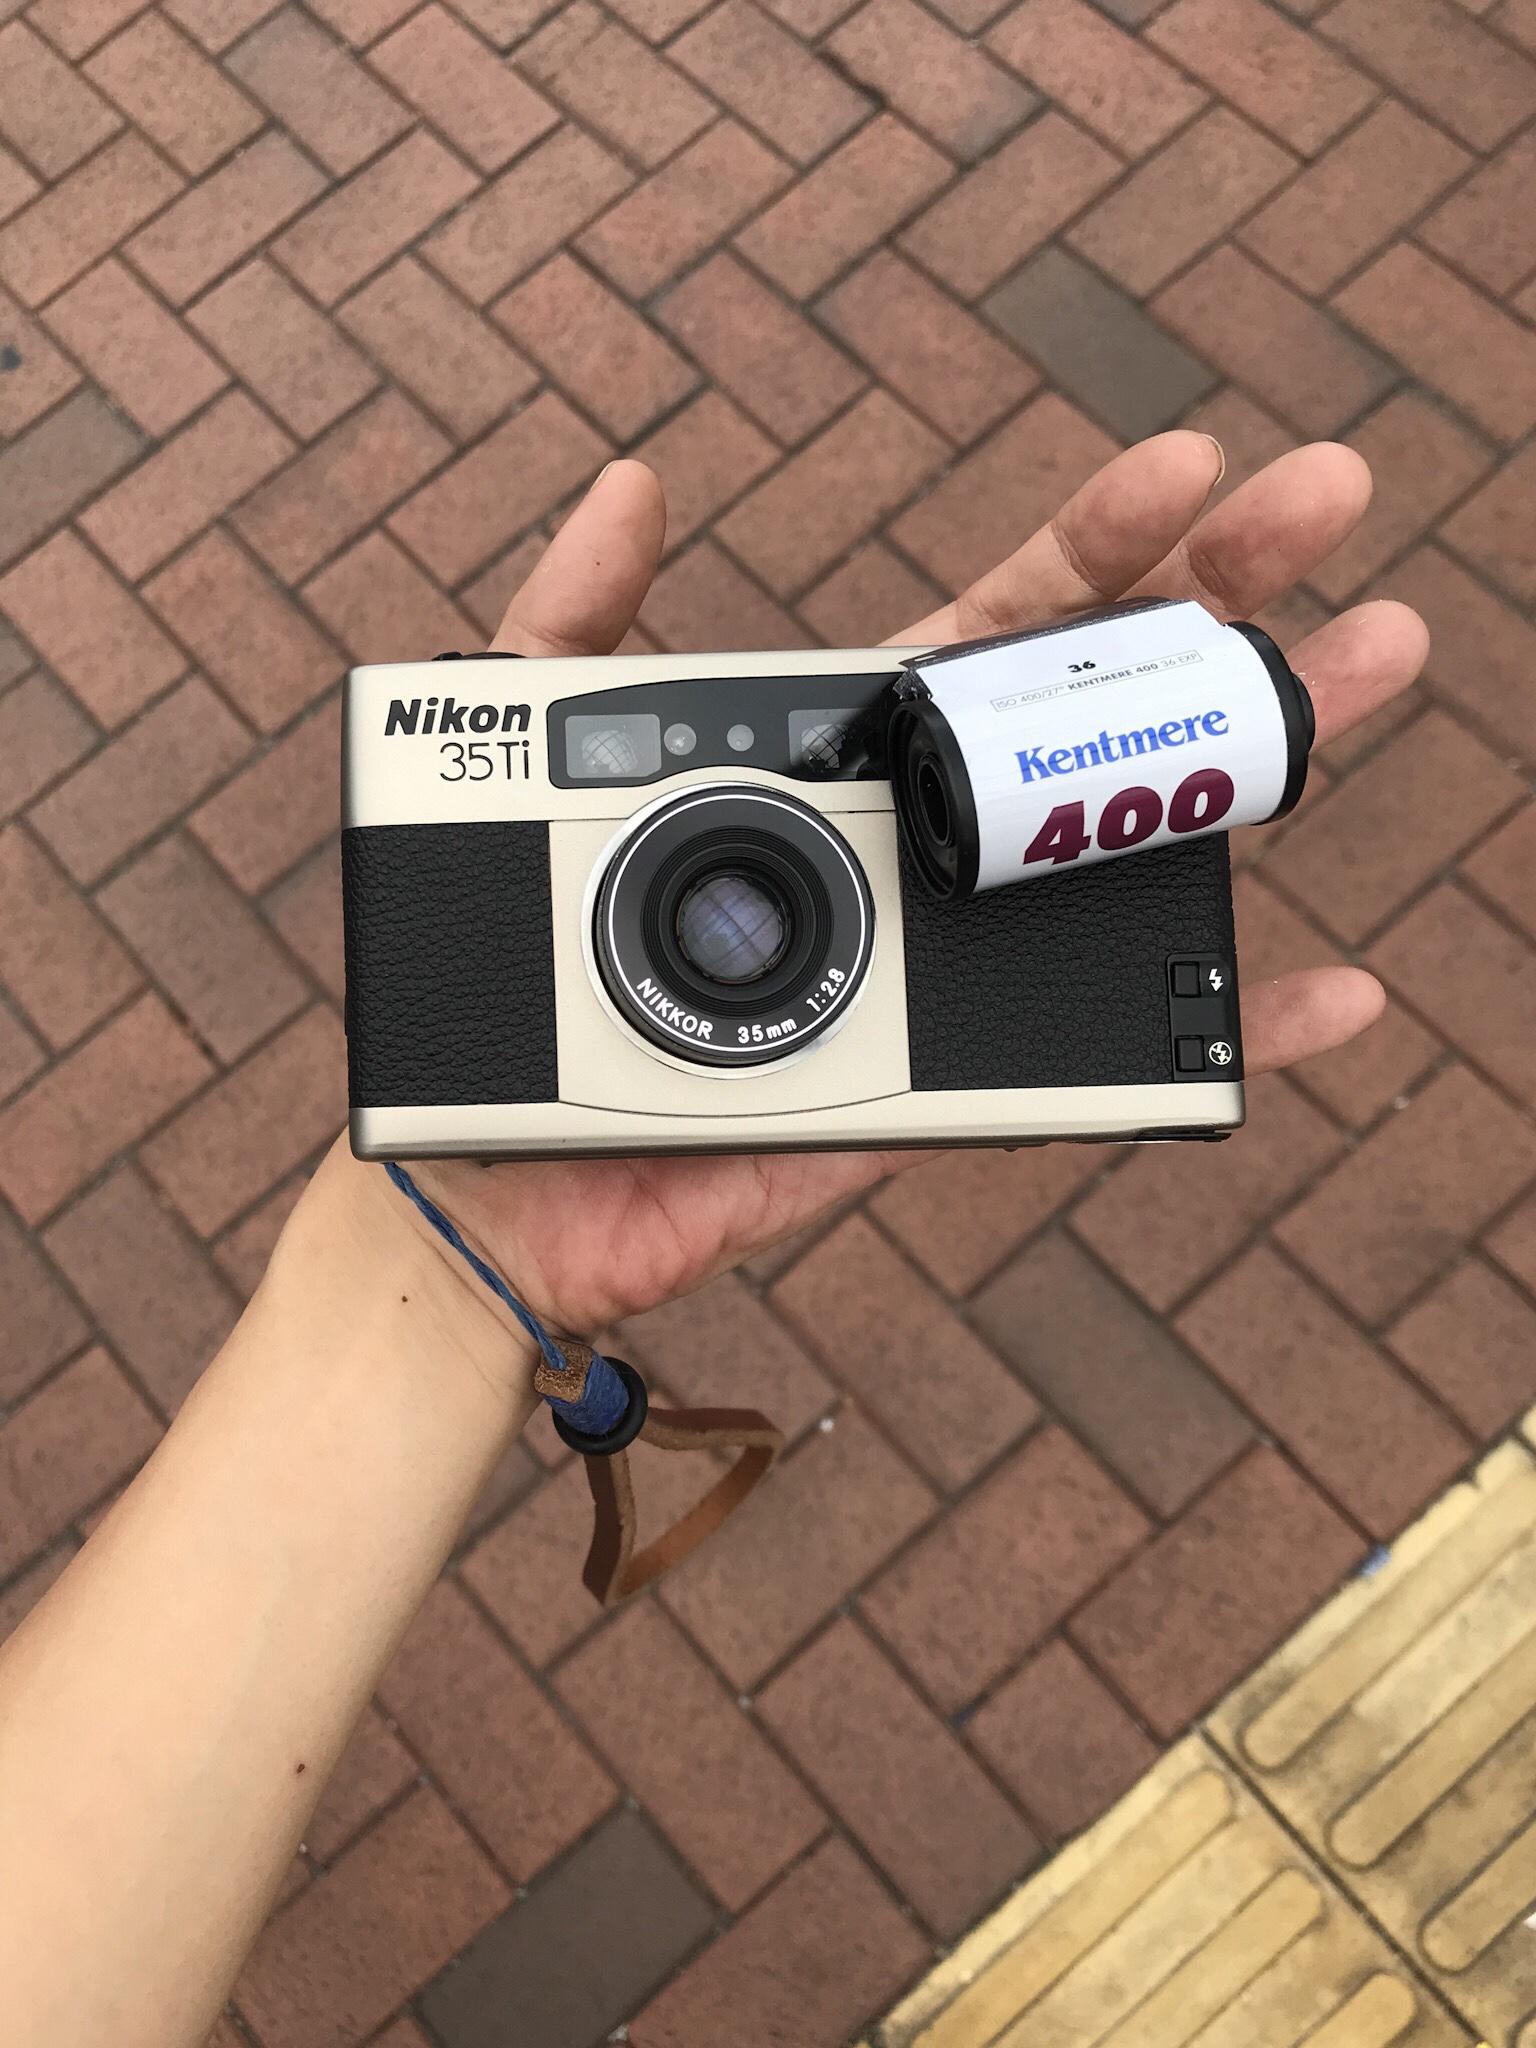 Nikon 35ti Film Camera photowalk hk